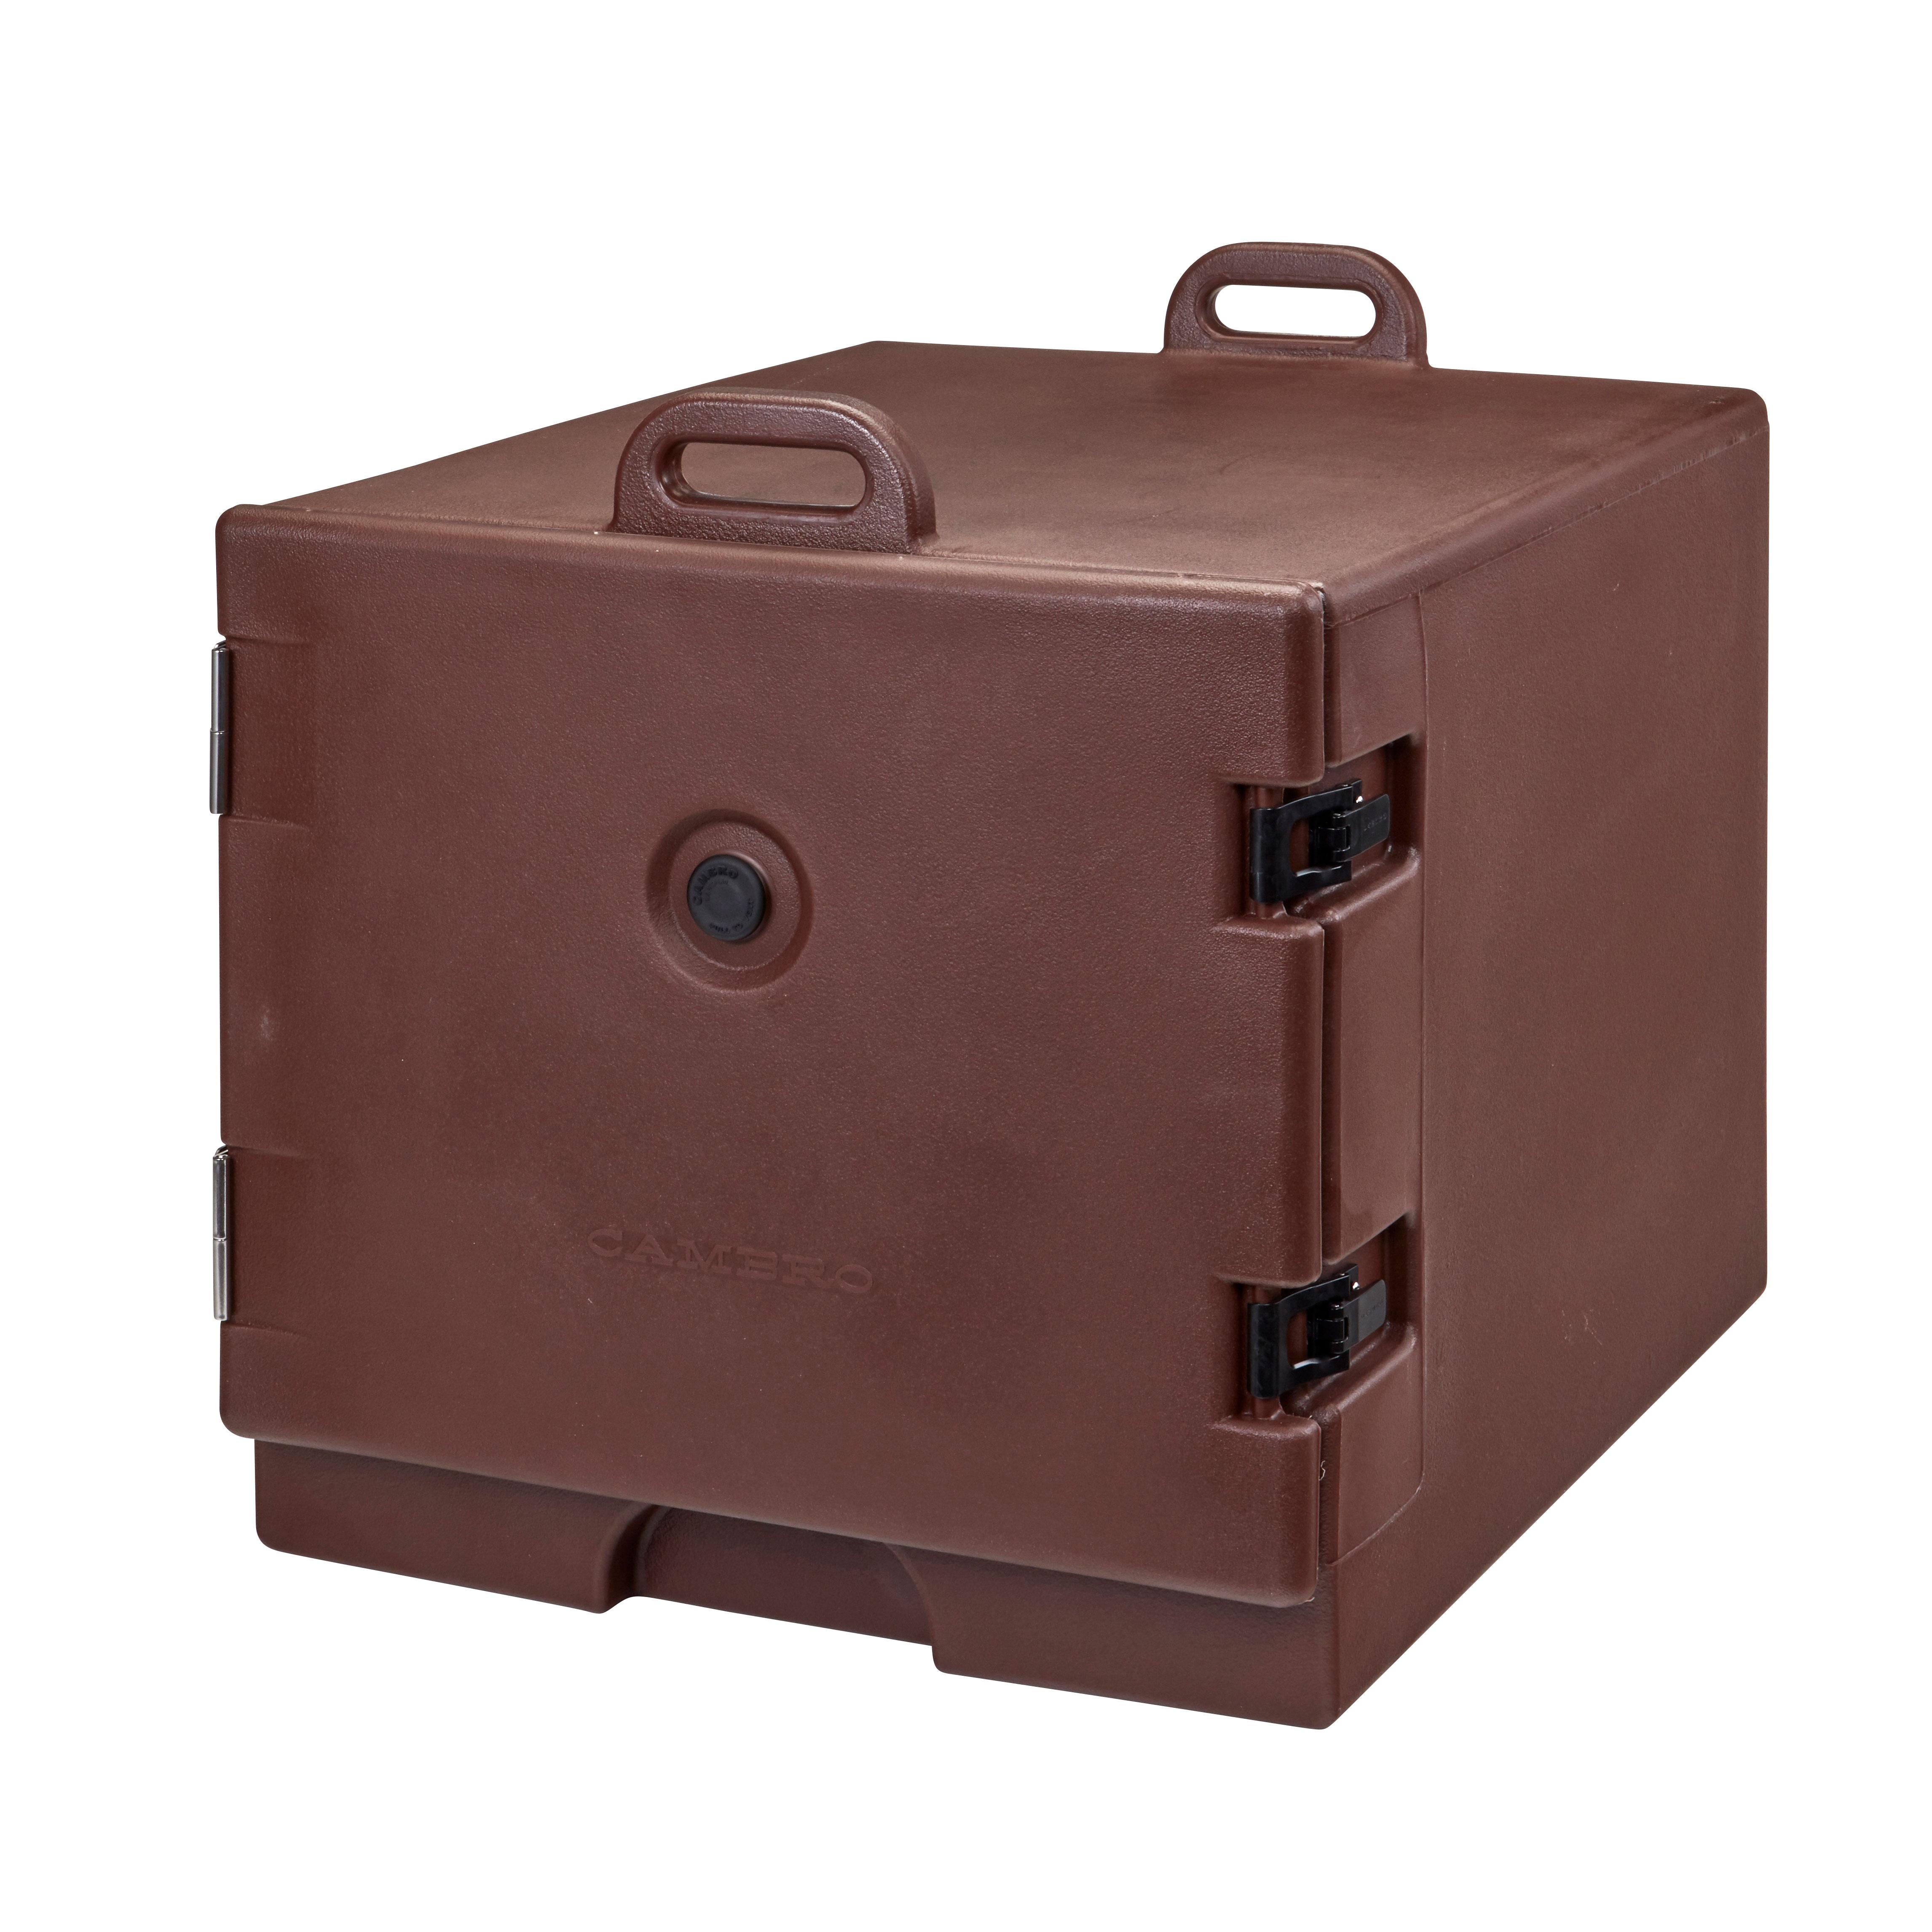 Cambro 1826MTC131 insulated food storage